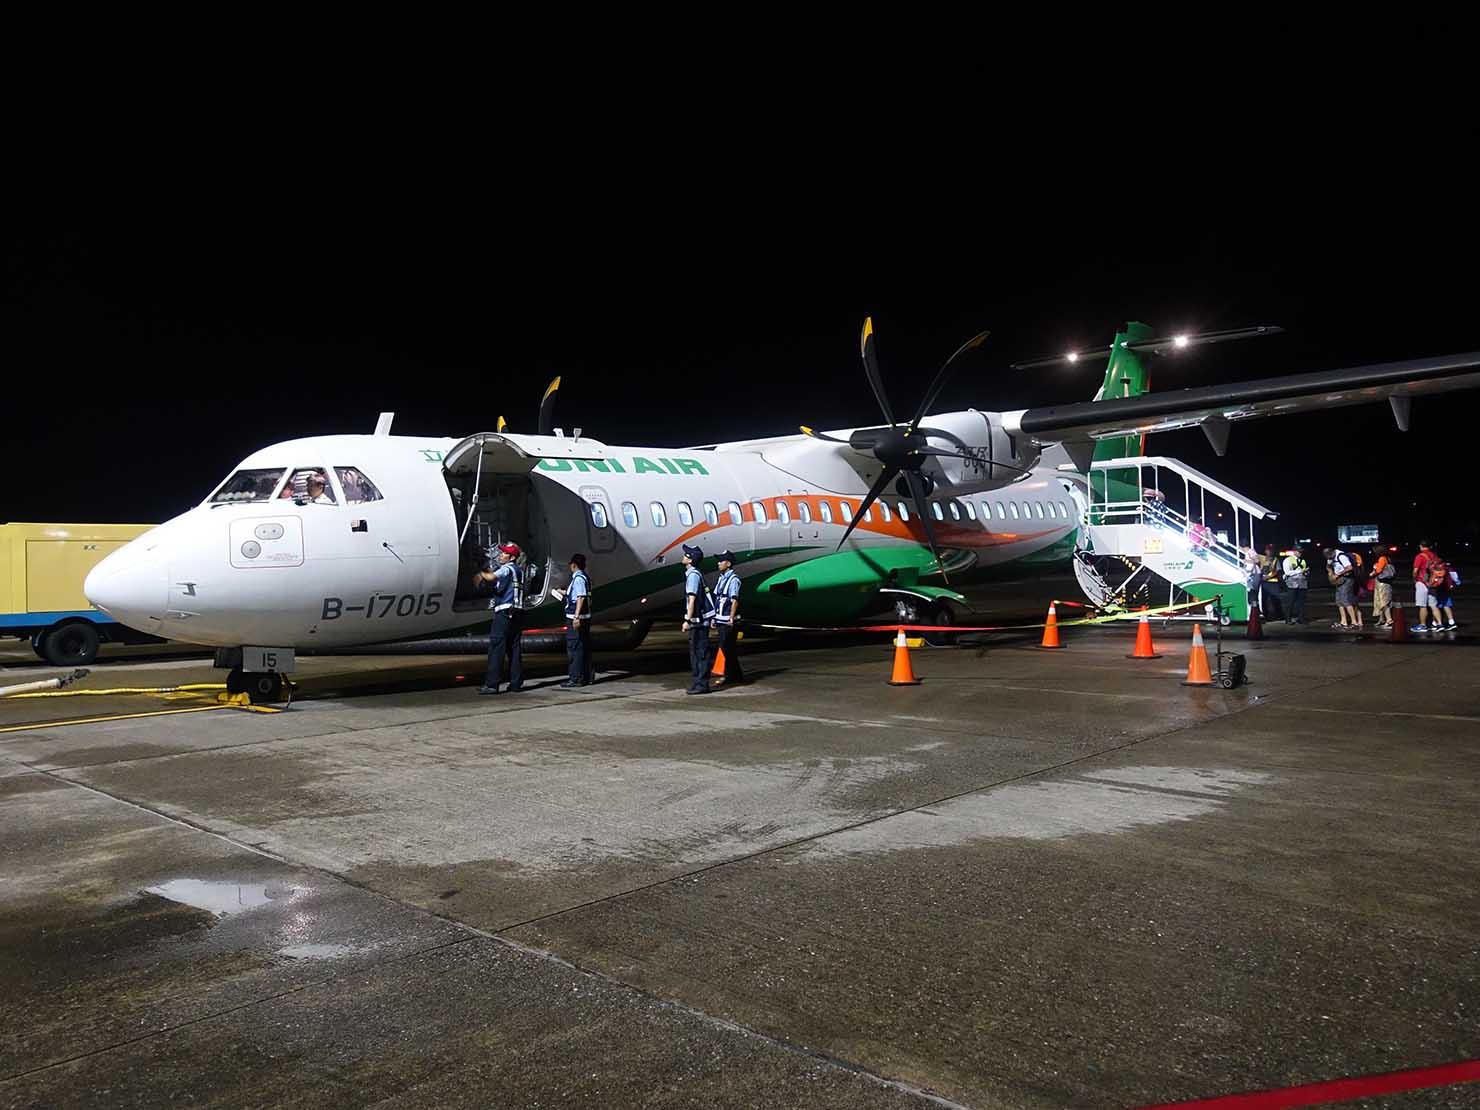 KKday外国人限定「花蓮・太魯閣(タロコ)日帰りツアー」台北・松山空港に到着した立榮航空(UNI AIR)の飛行機